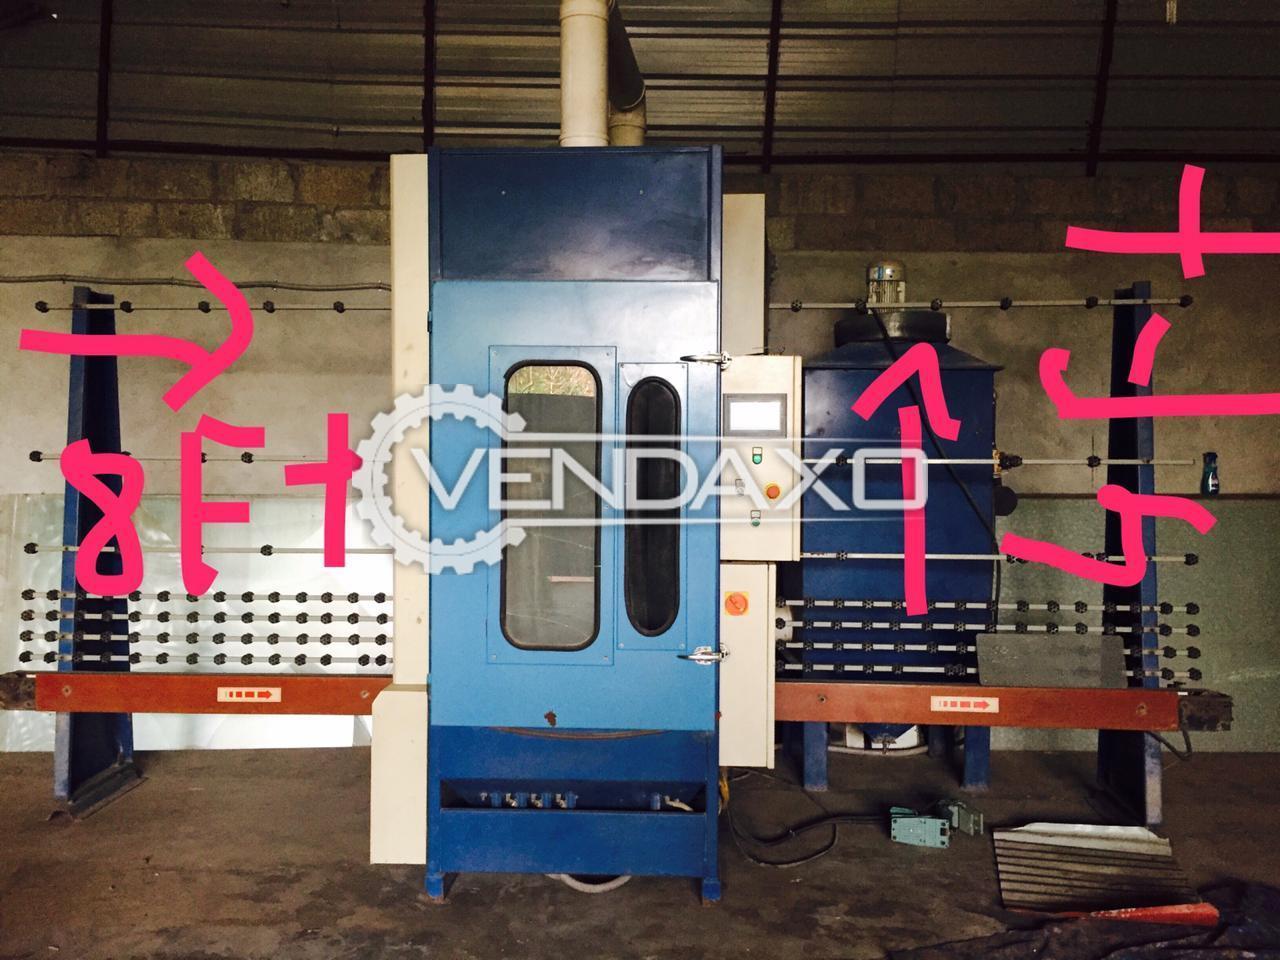 Automatic Glass Sand Blasting Machine - 8 x 4 Feet